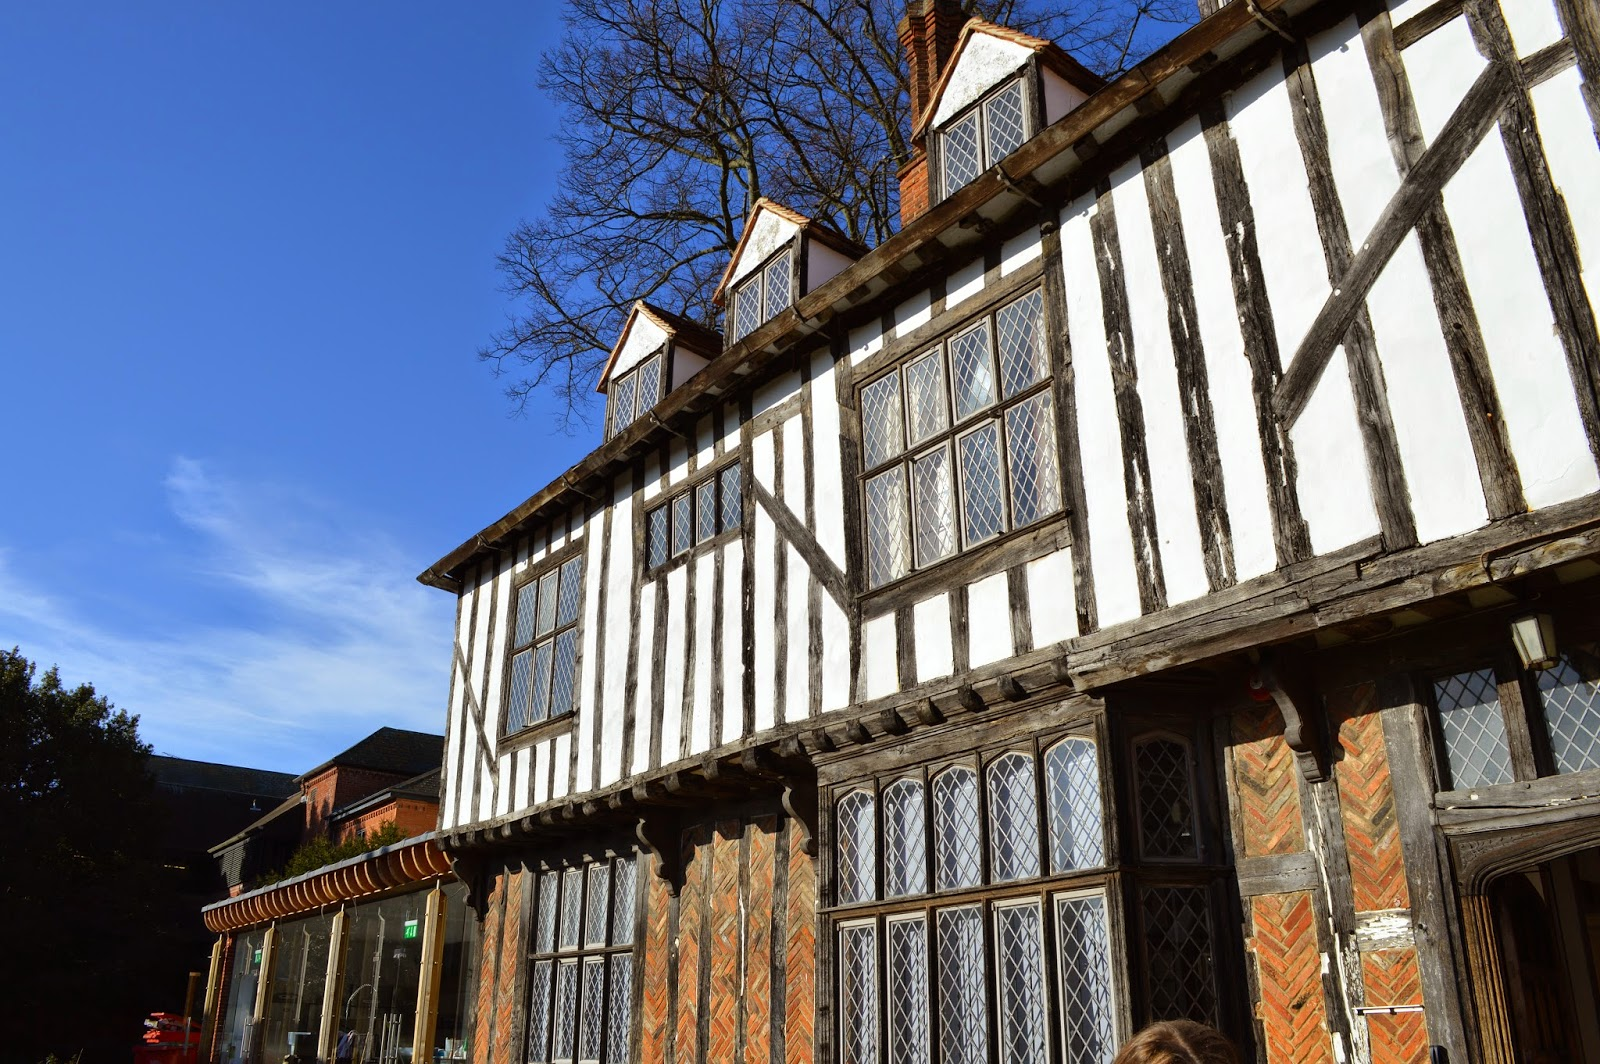 pub, Tudor House, Colchester, black and White beams, diamond windows, historical, traditional